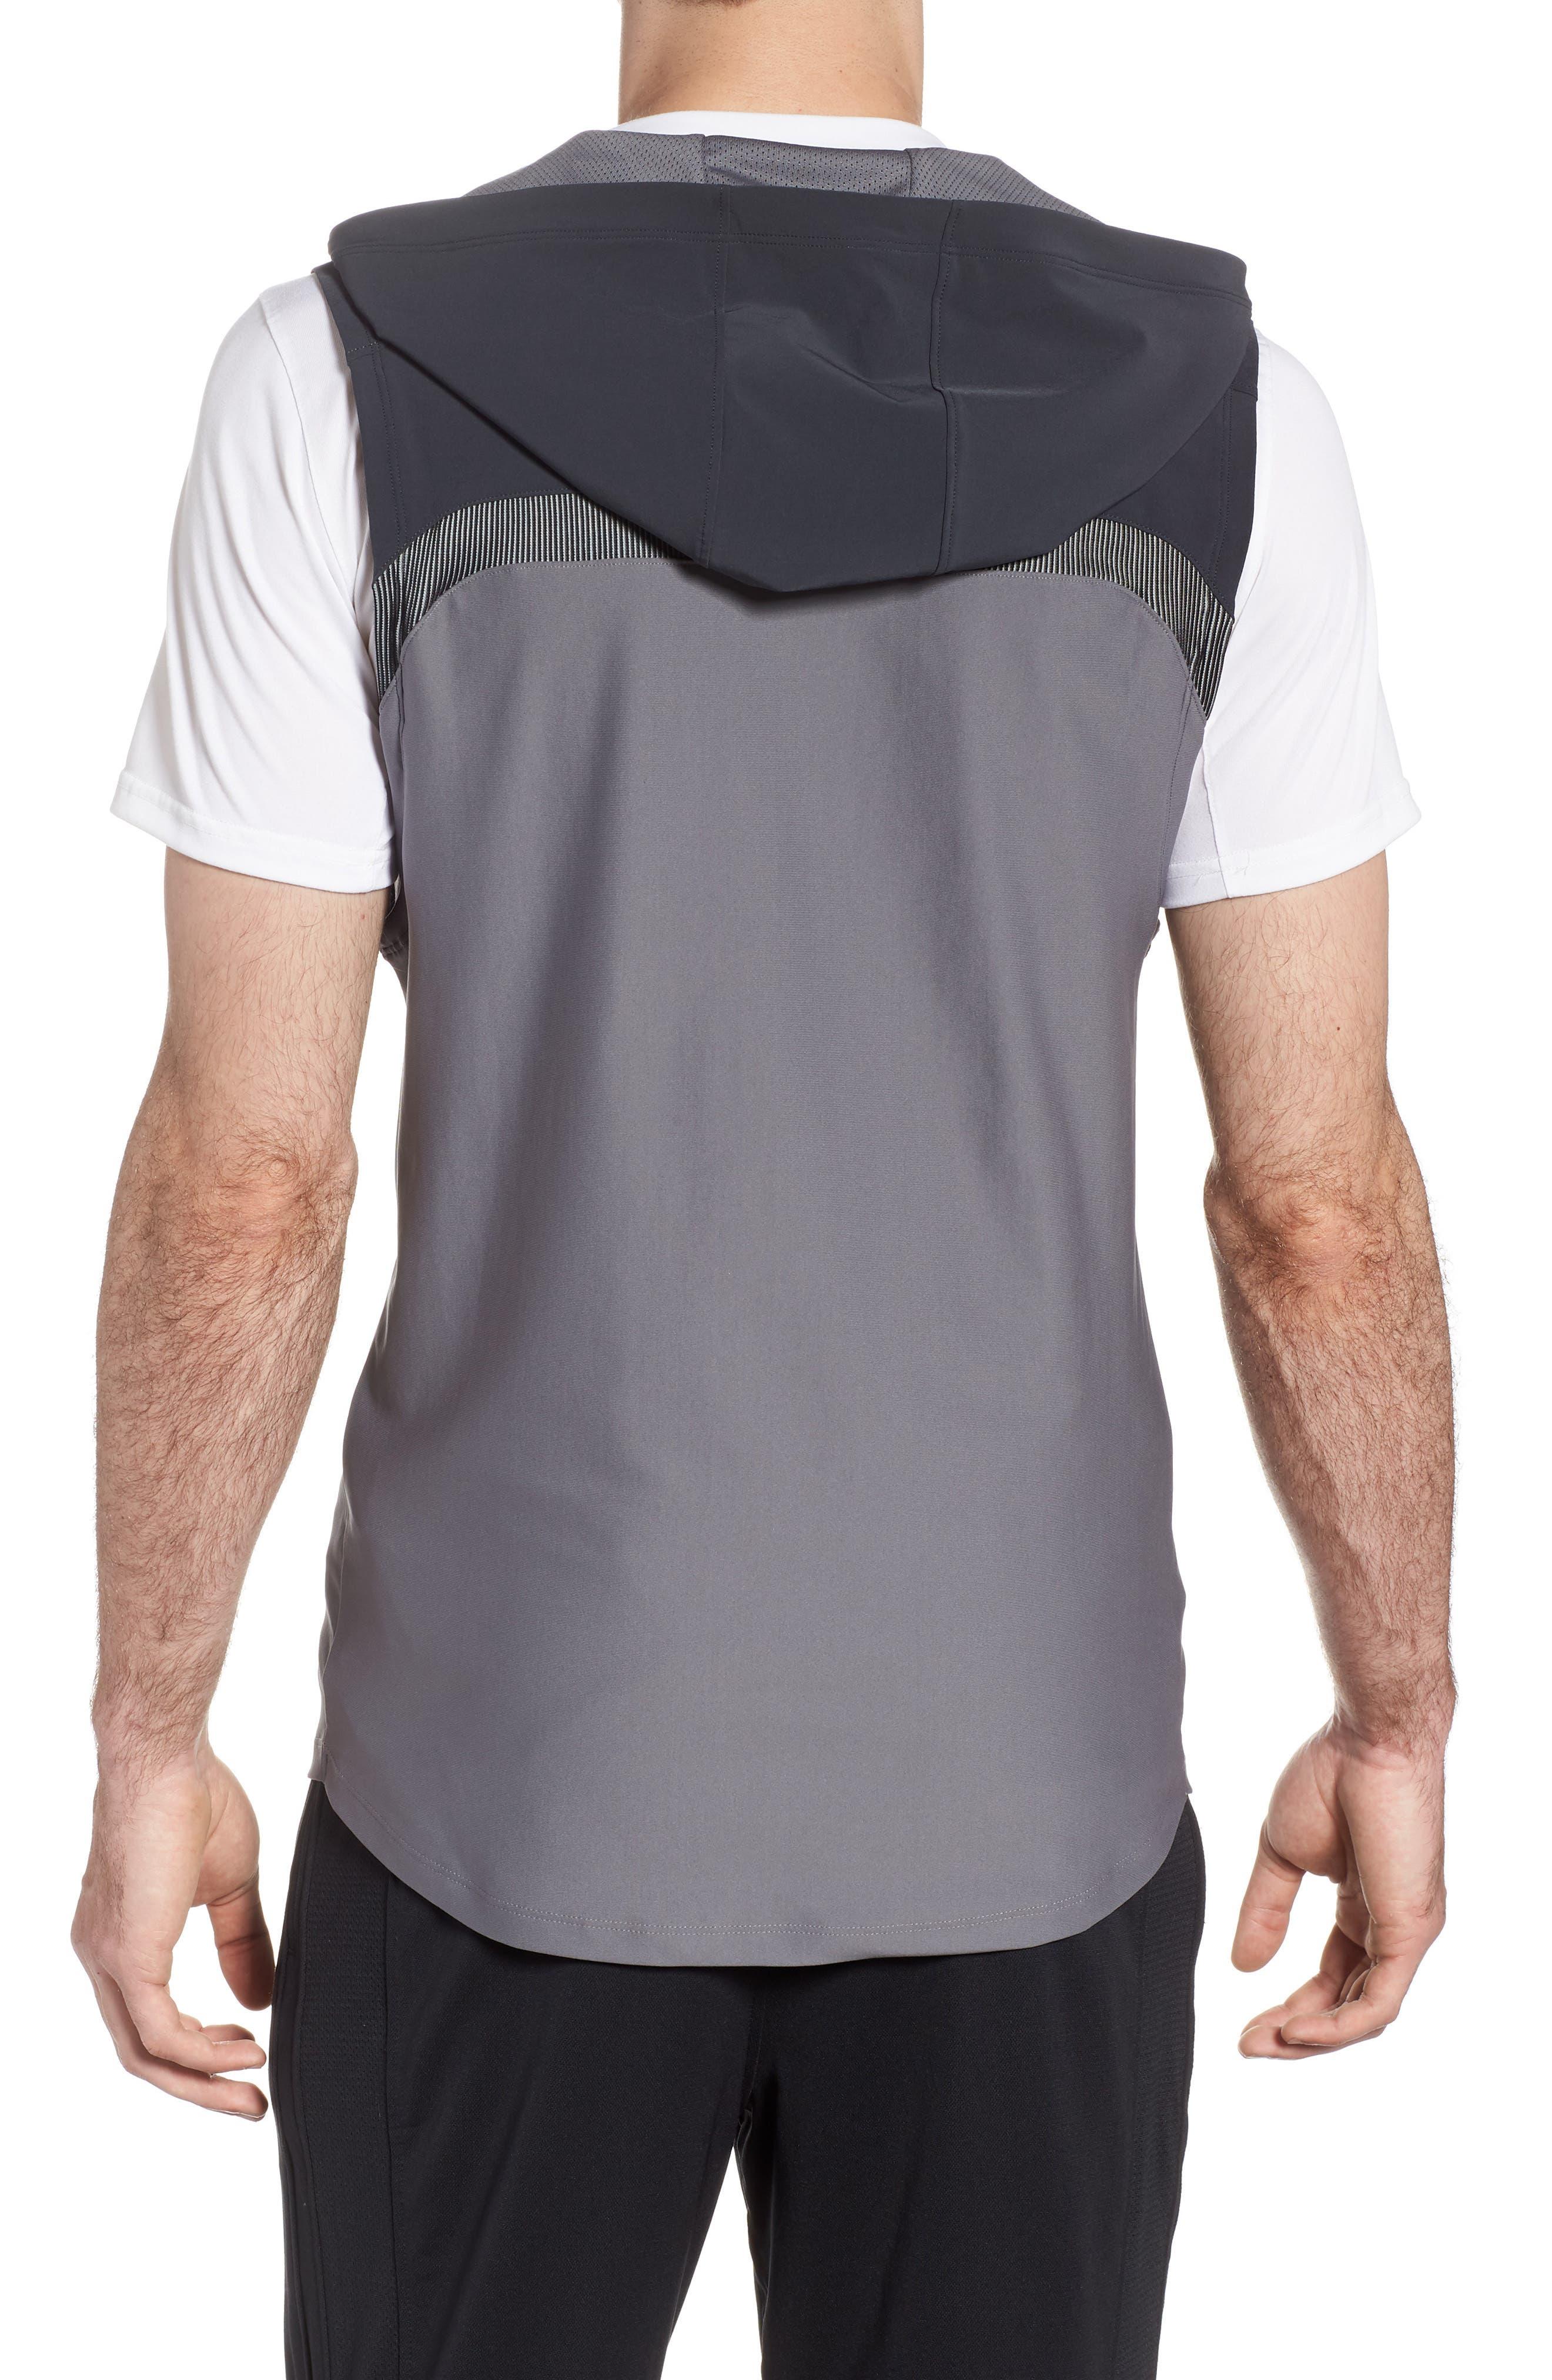 Threadborne Vanish Vest,                             Alternate thumbnail 2, color,                             Anthracite / Graphite/ Iron